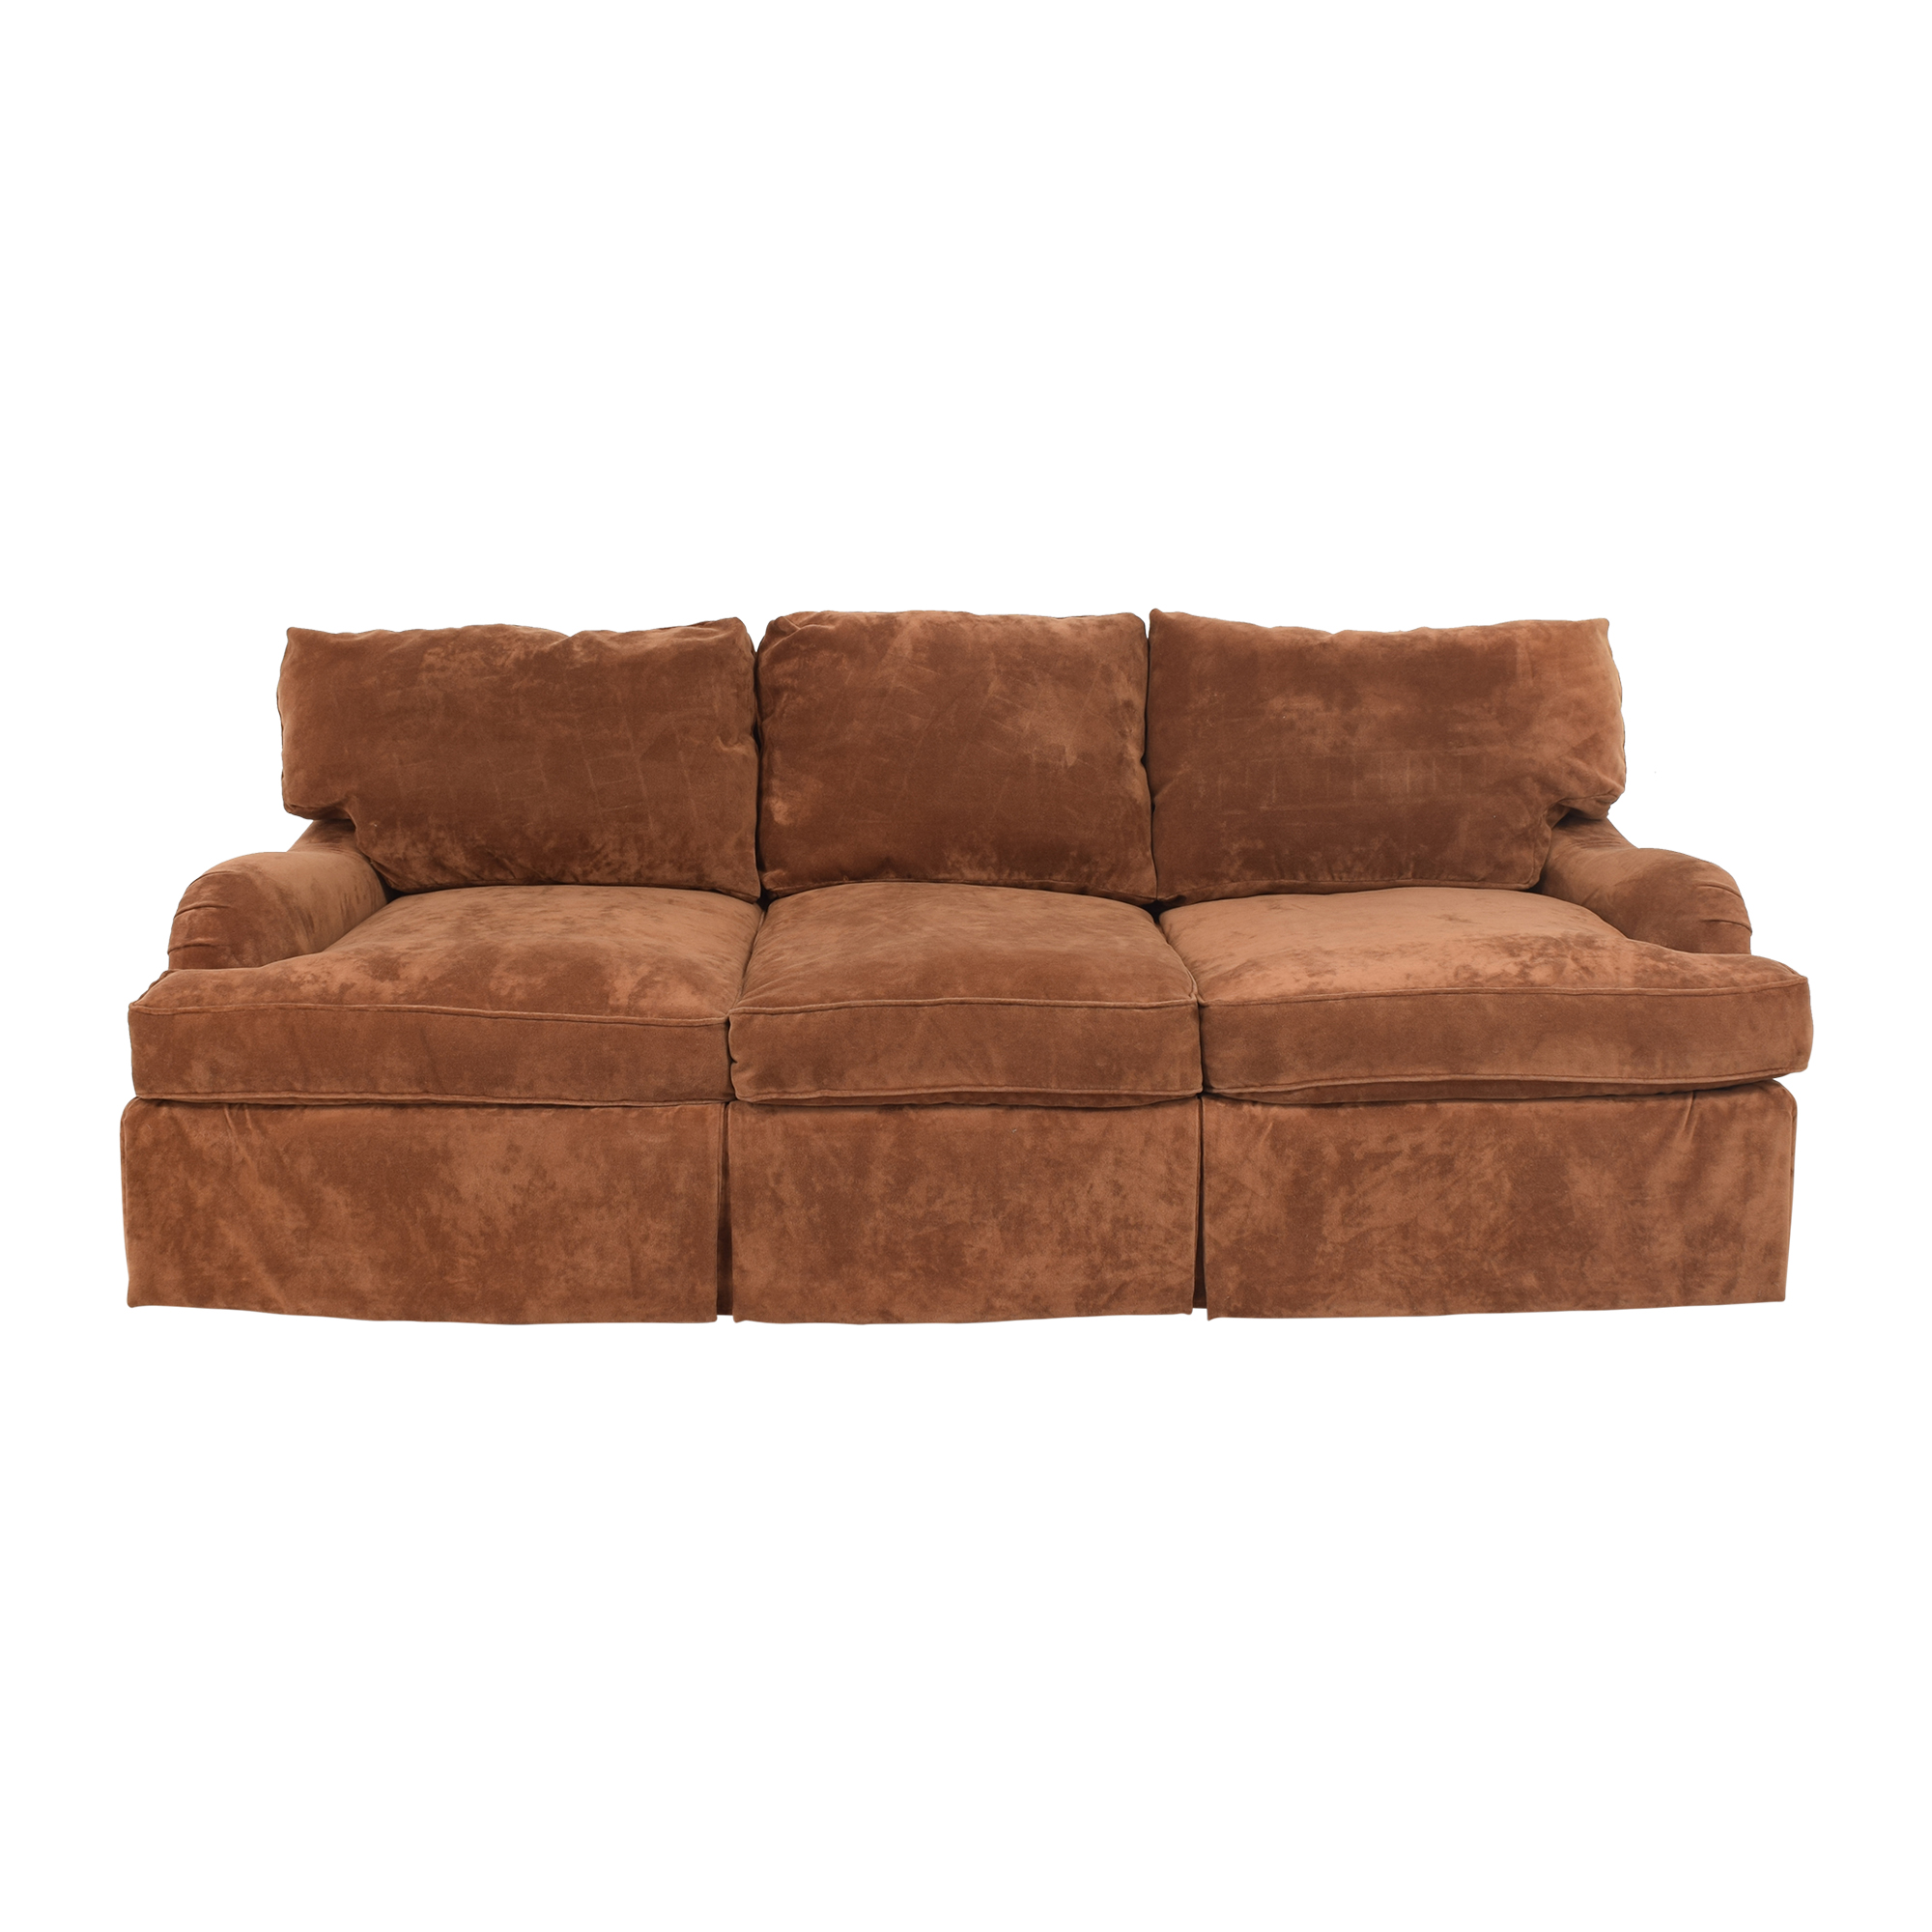 Bernhardt Bernhardt Skirted Three Cushion Sofa Classic Sofas